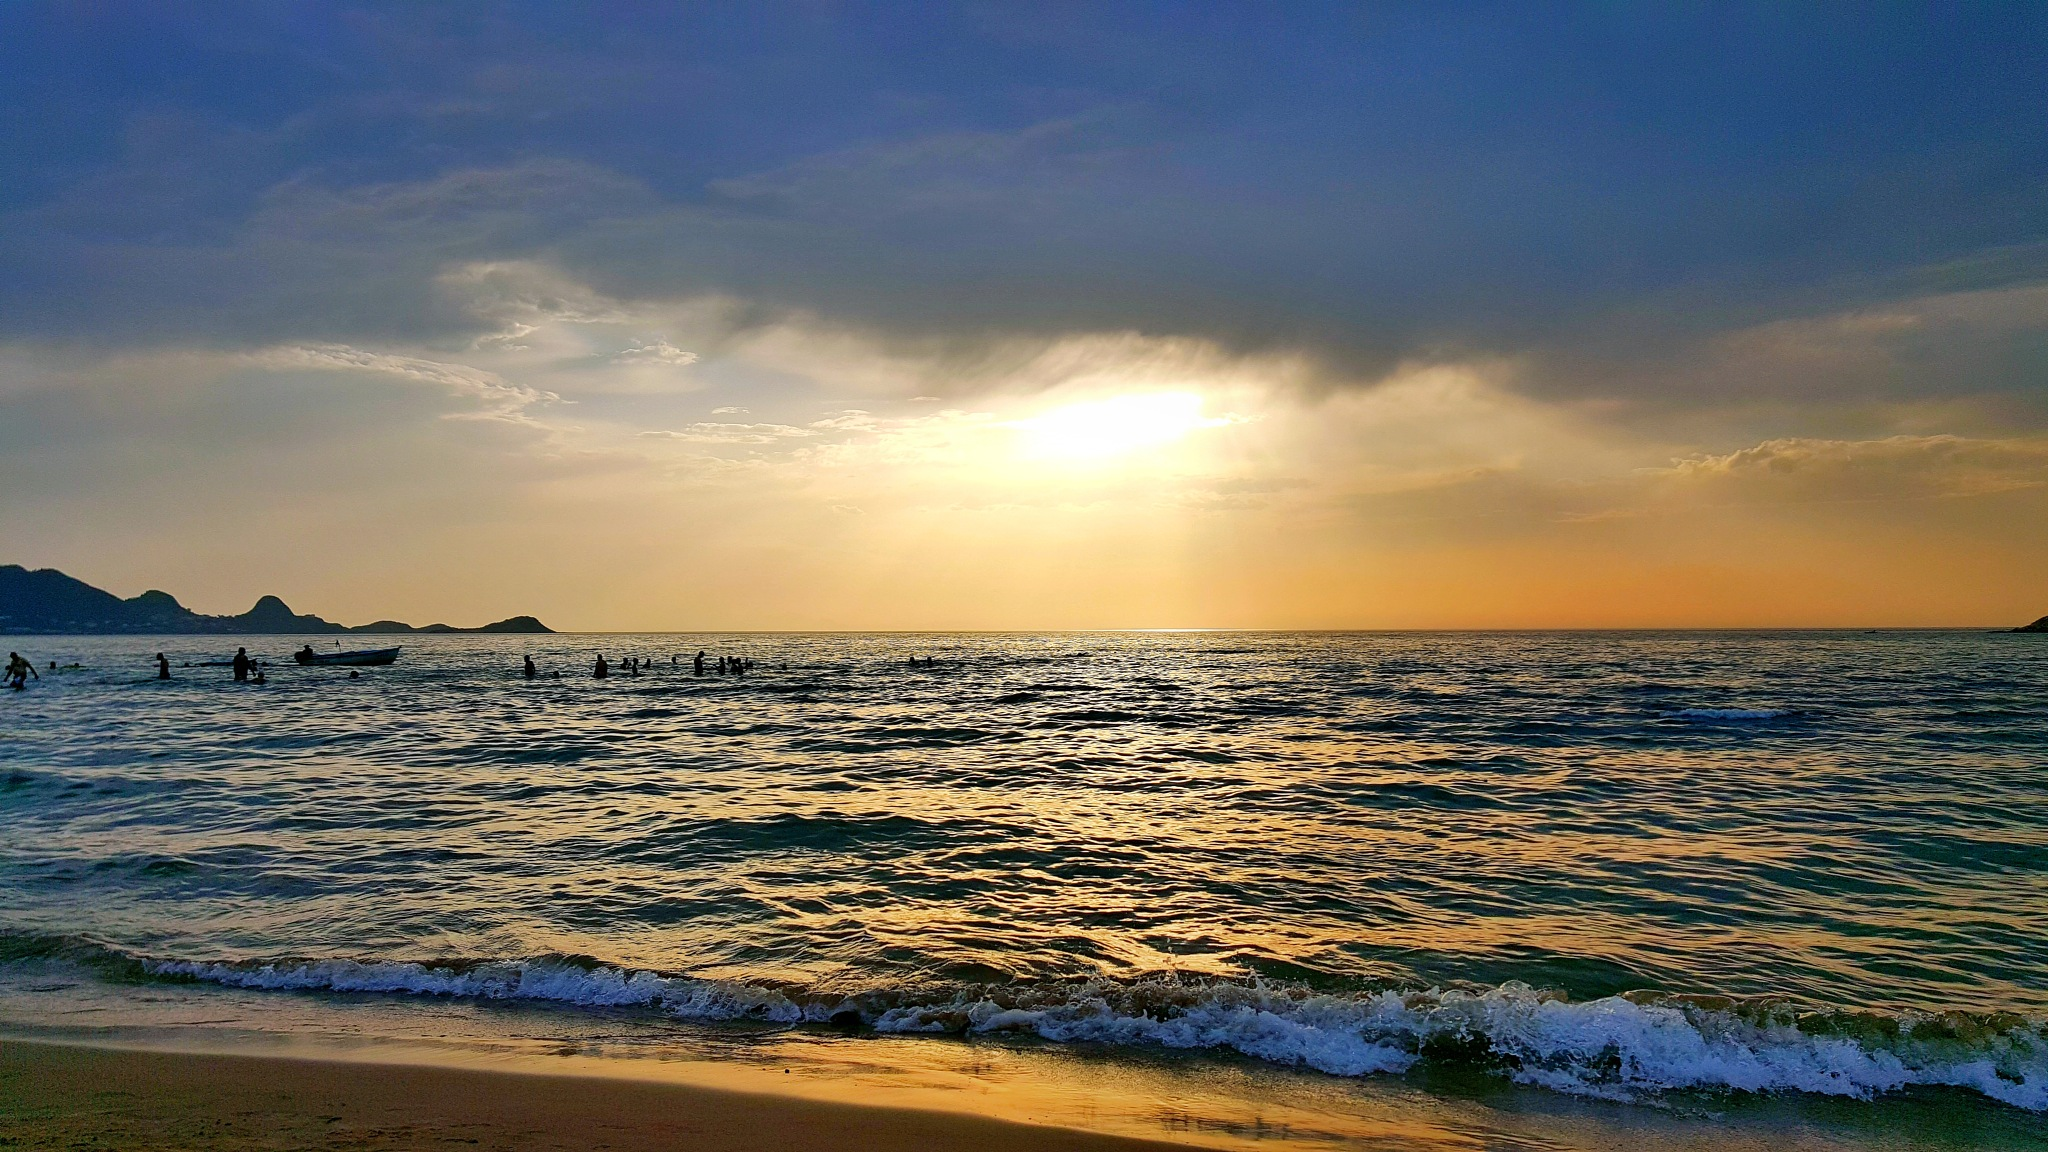 sea sunset by zakaria sadouni